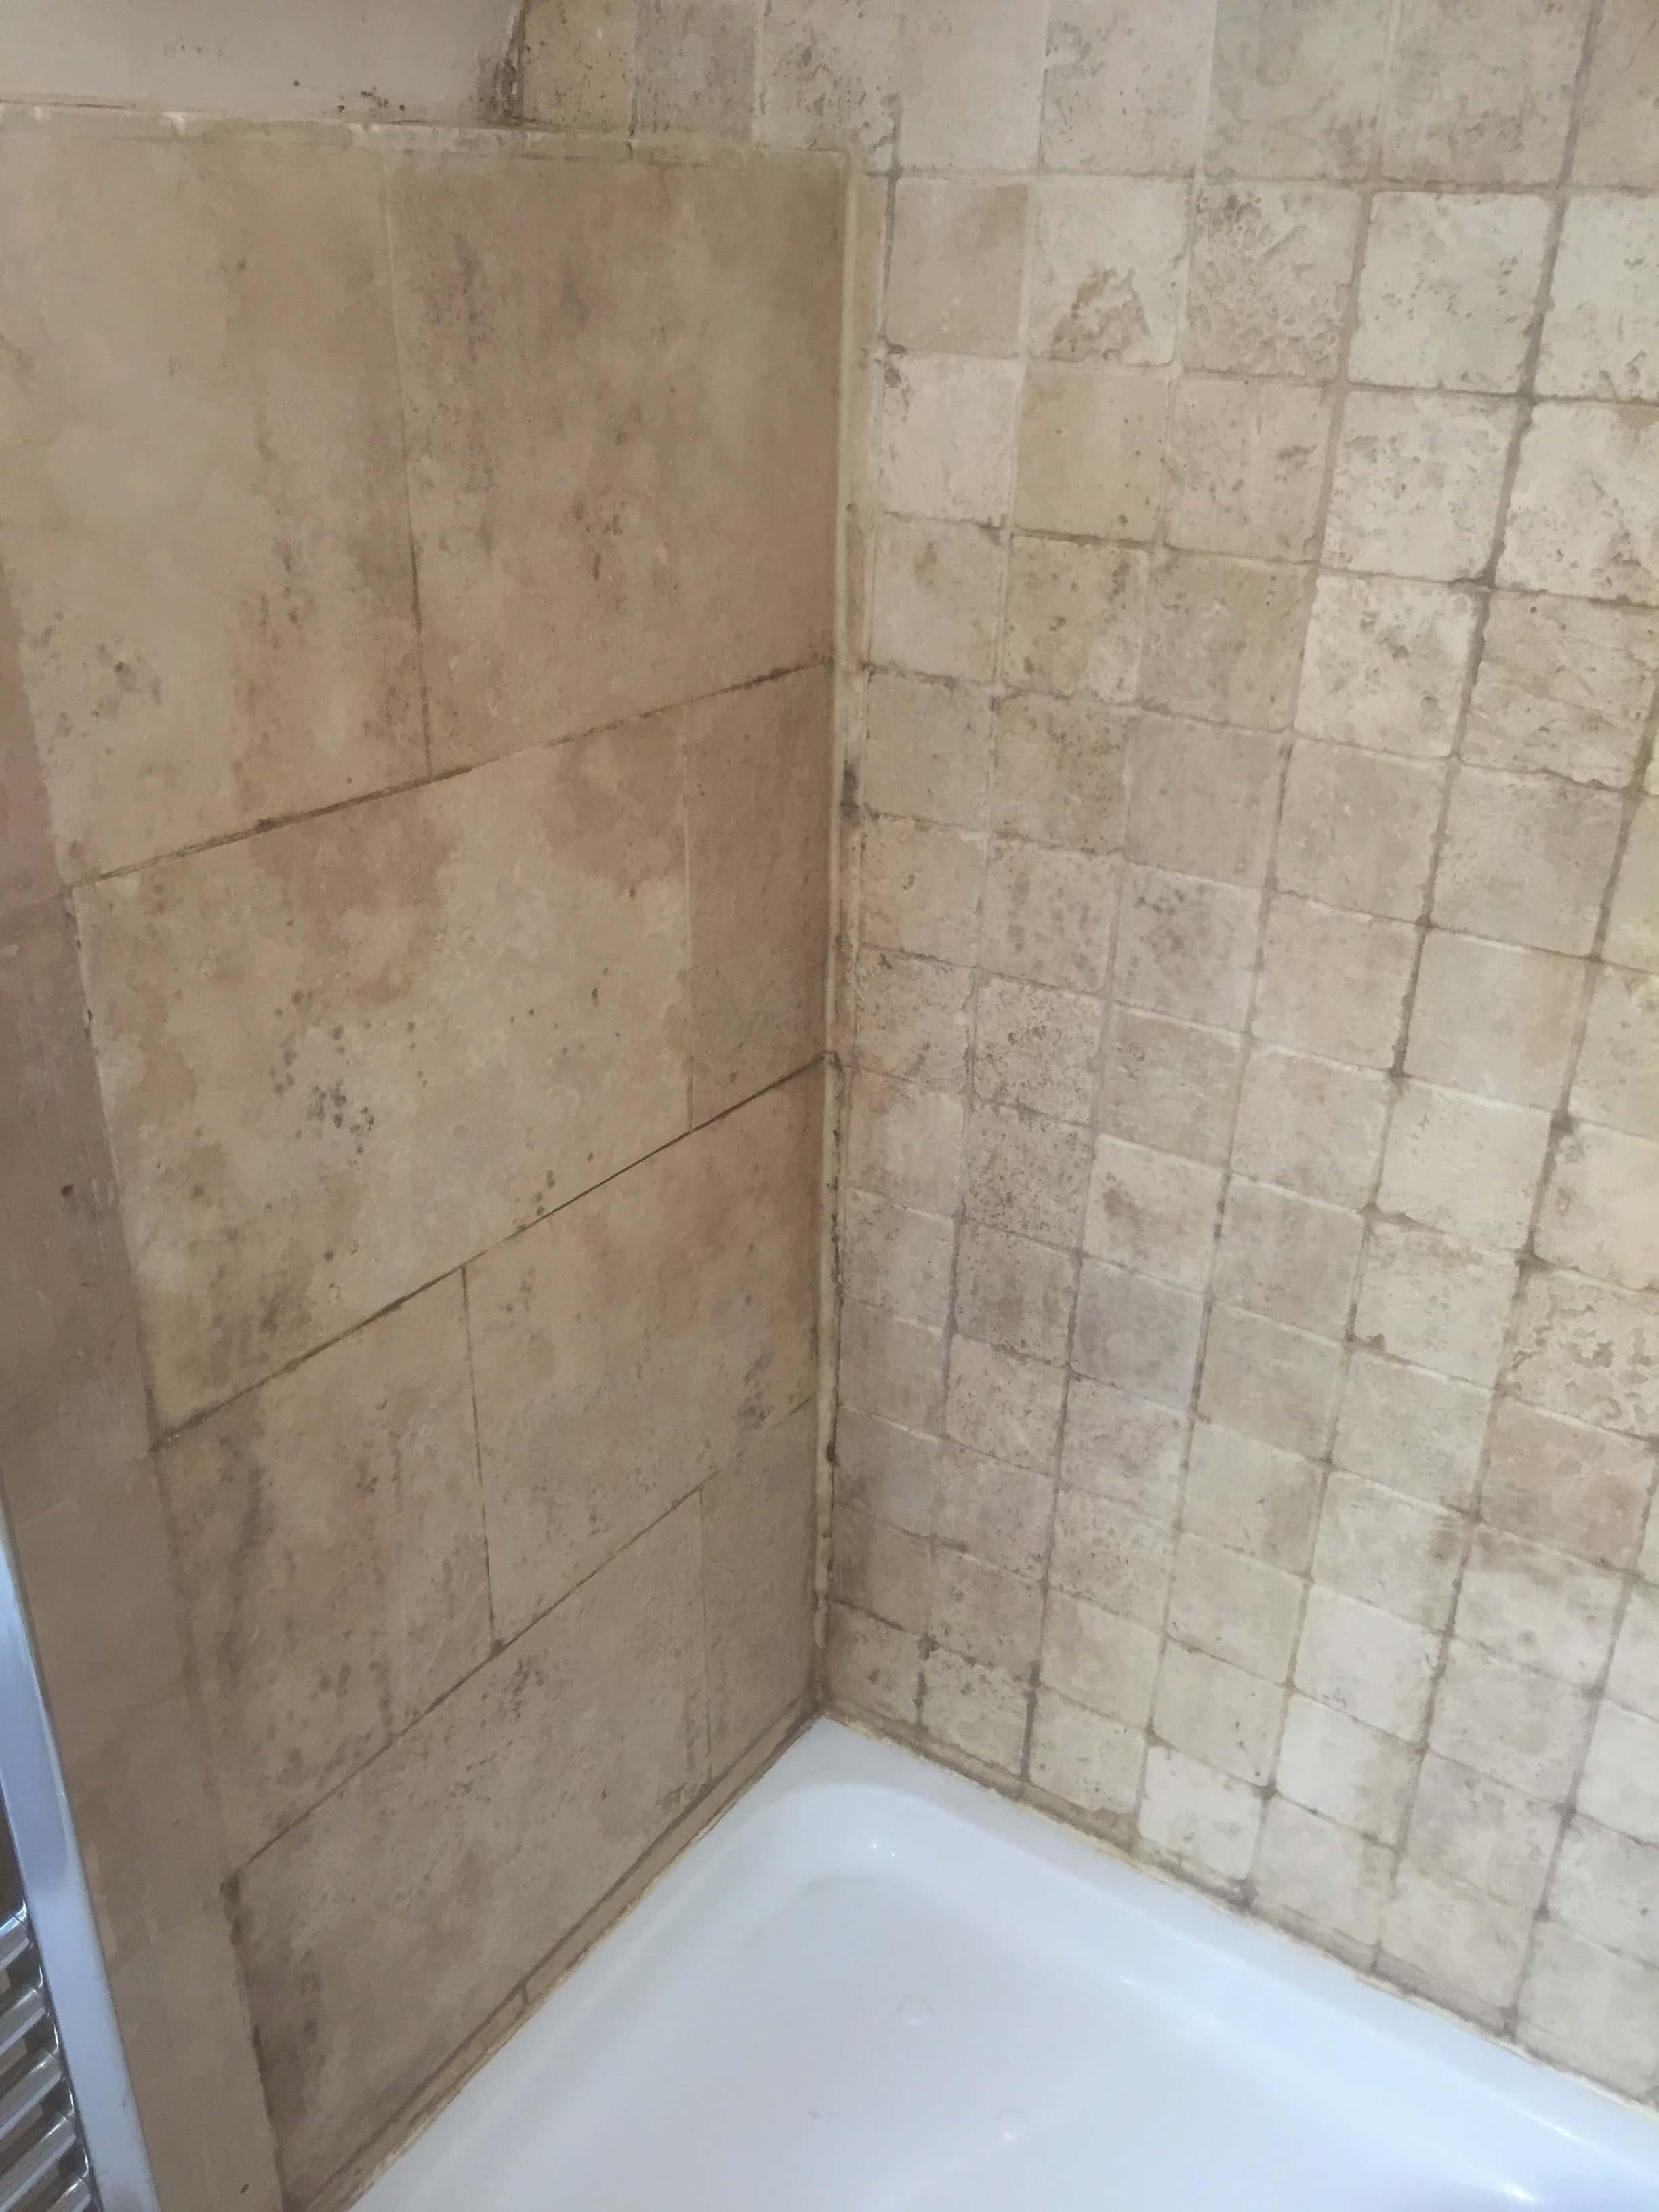 Restoring A Travertine Tiled Shower In